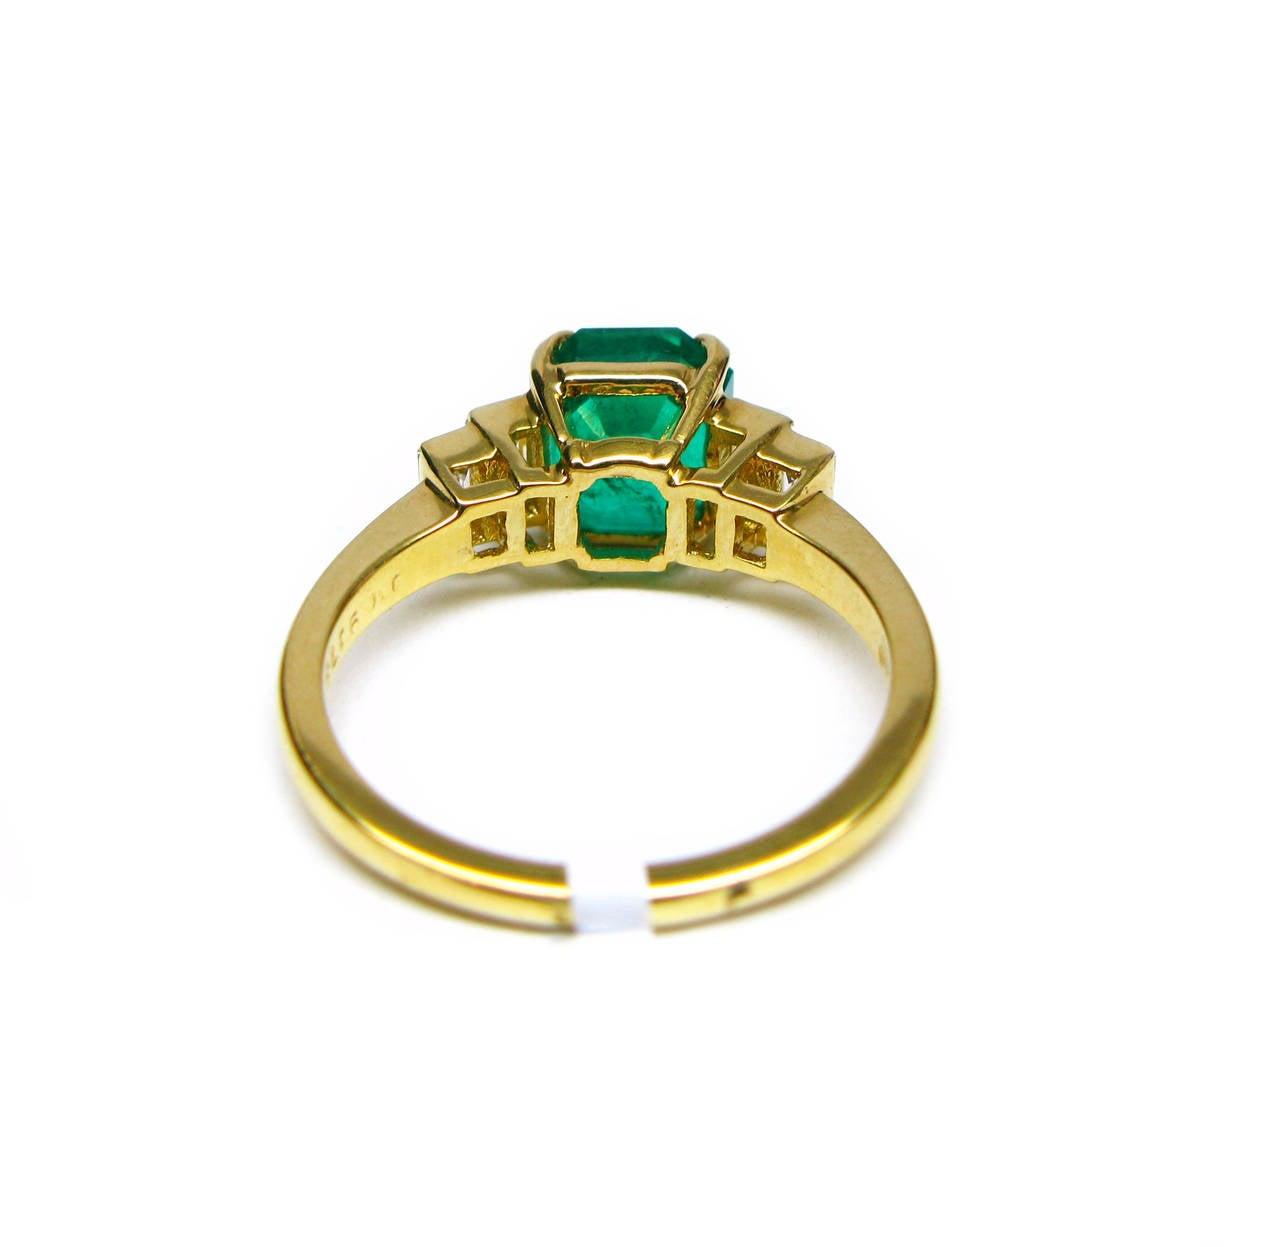 Kurt Wayne Emerald and Baguette Diamond Ring 3